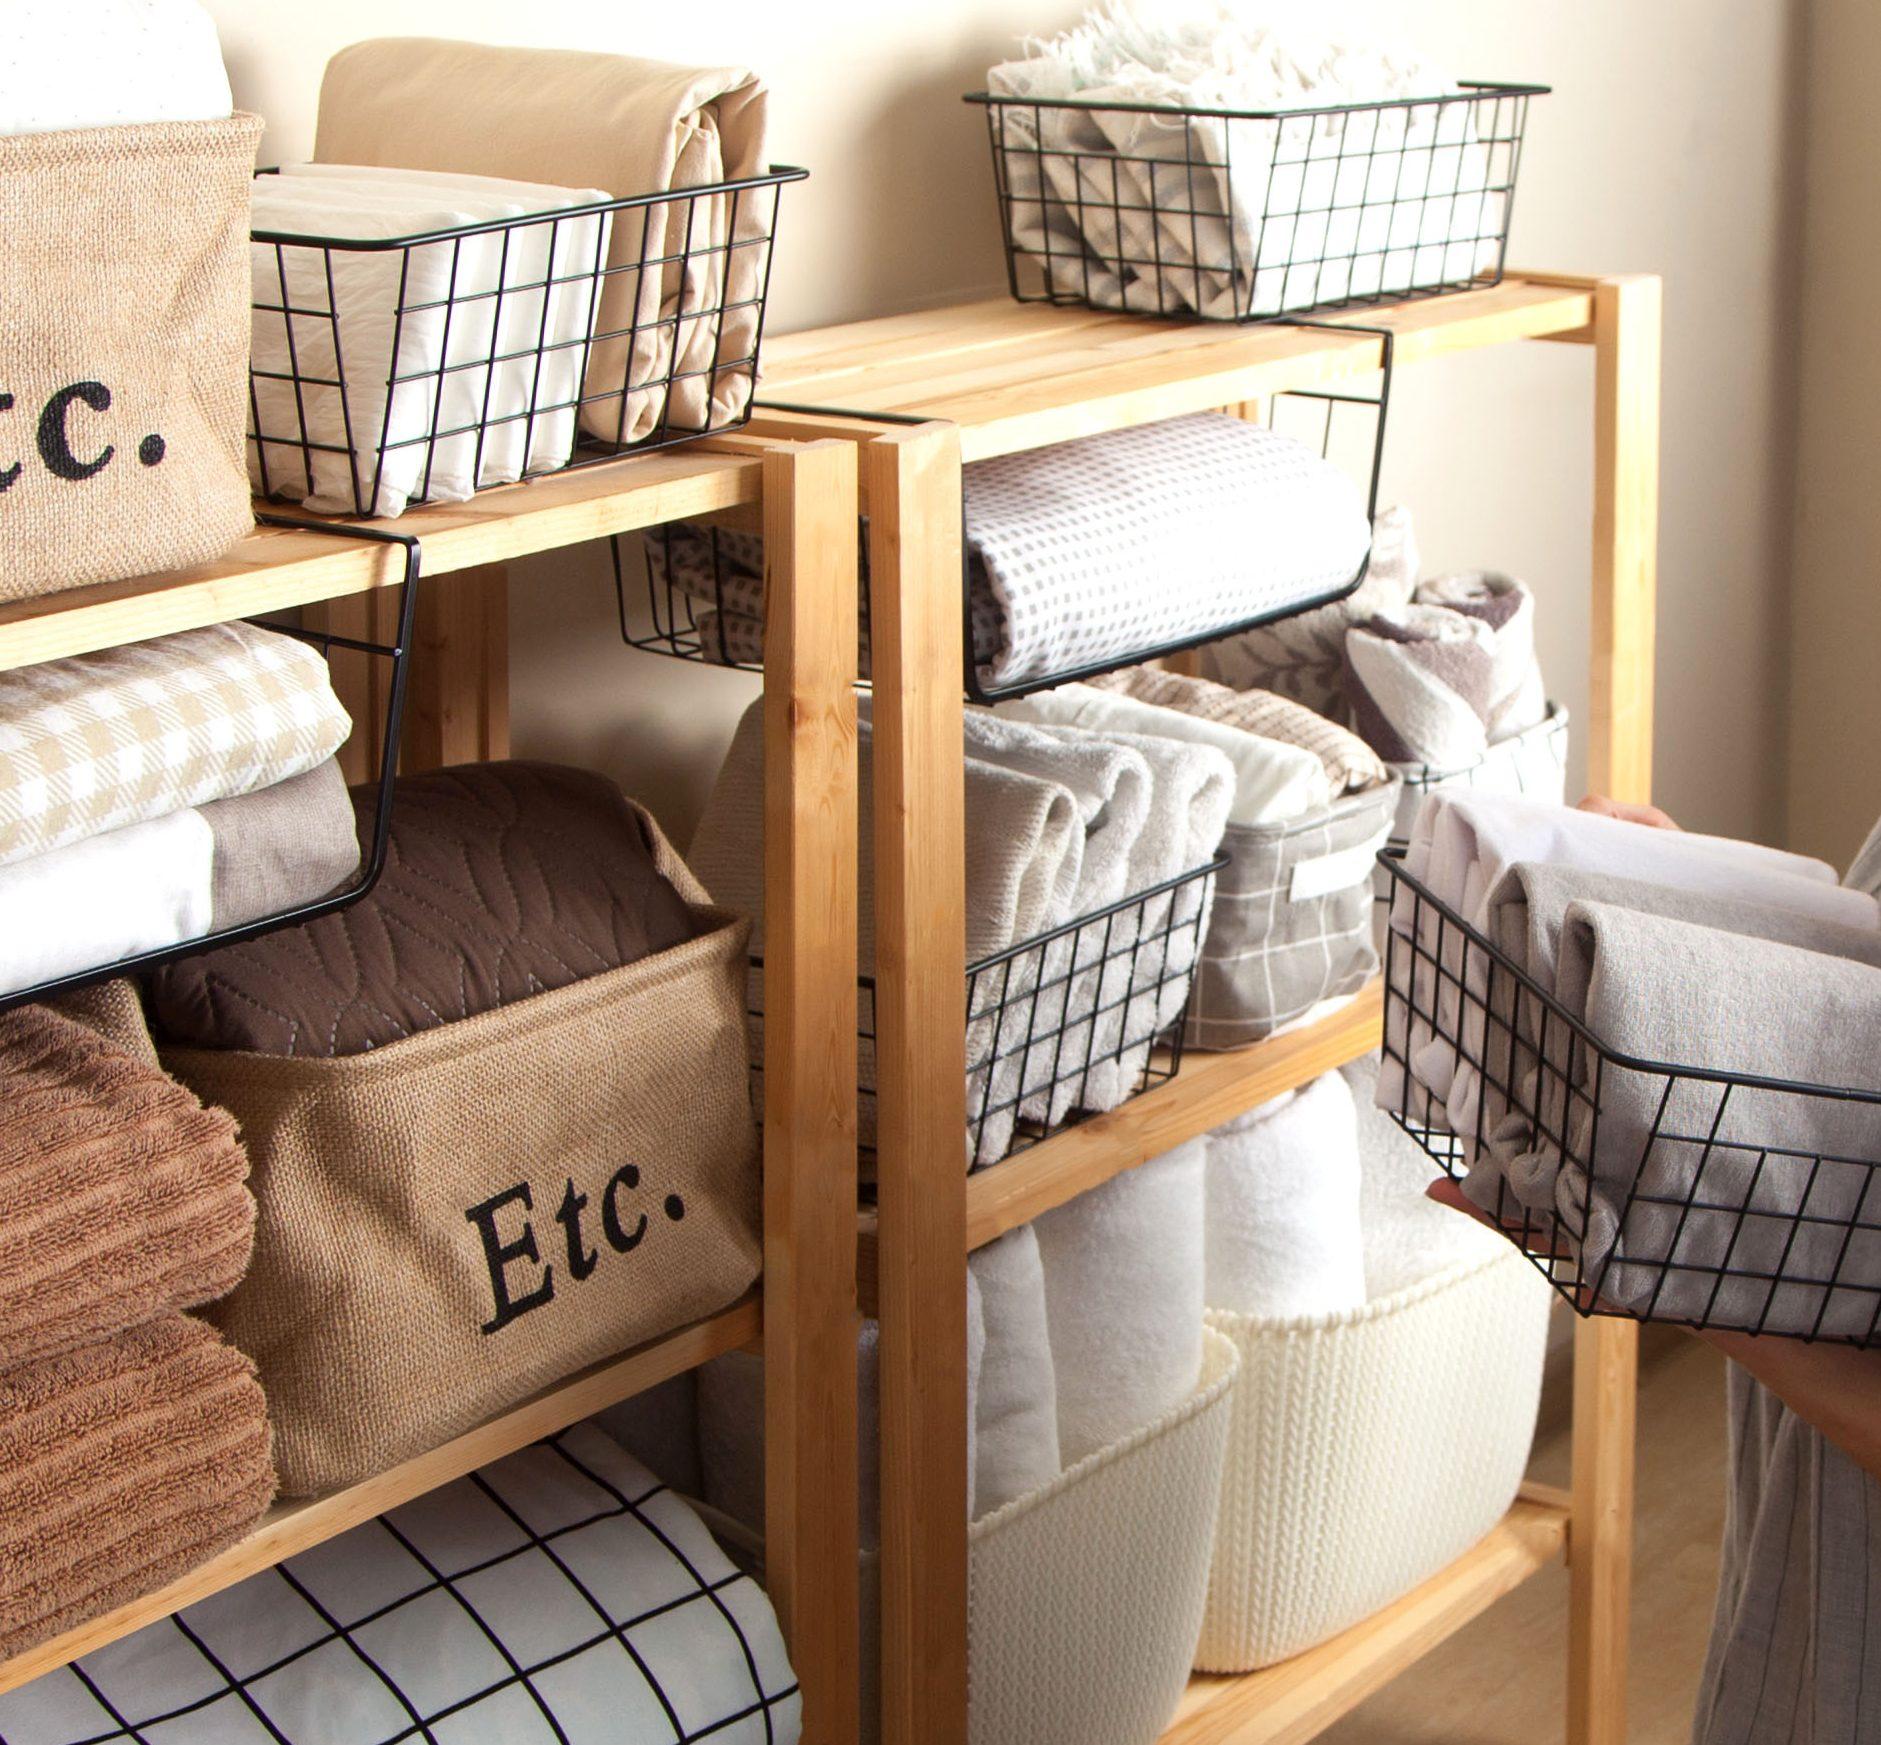 STYLECASTER | Blanket Storage ideas